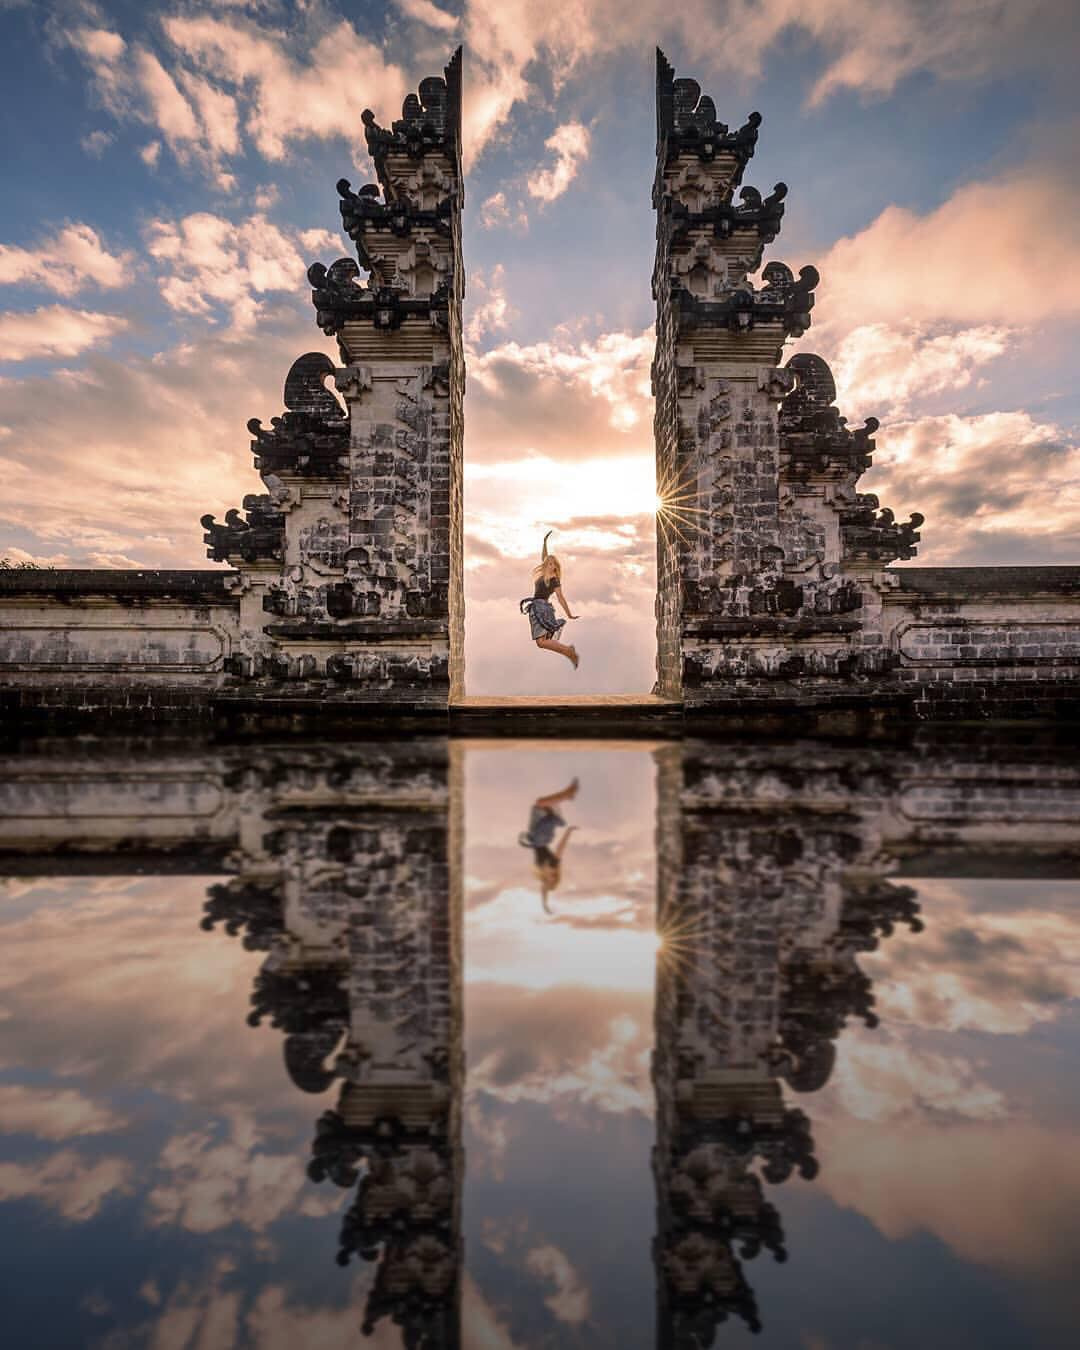 �:(�z+���!��a_印尼-千岛之国-bali巴厘岛-天空之门篇